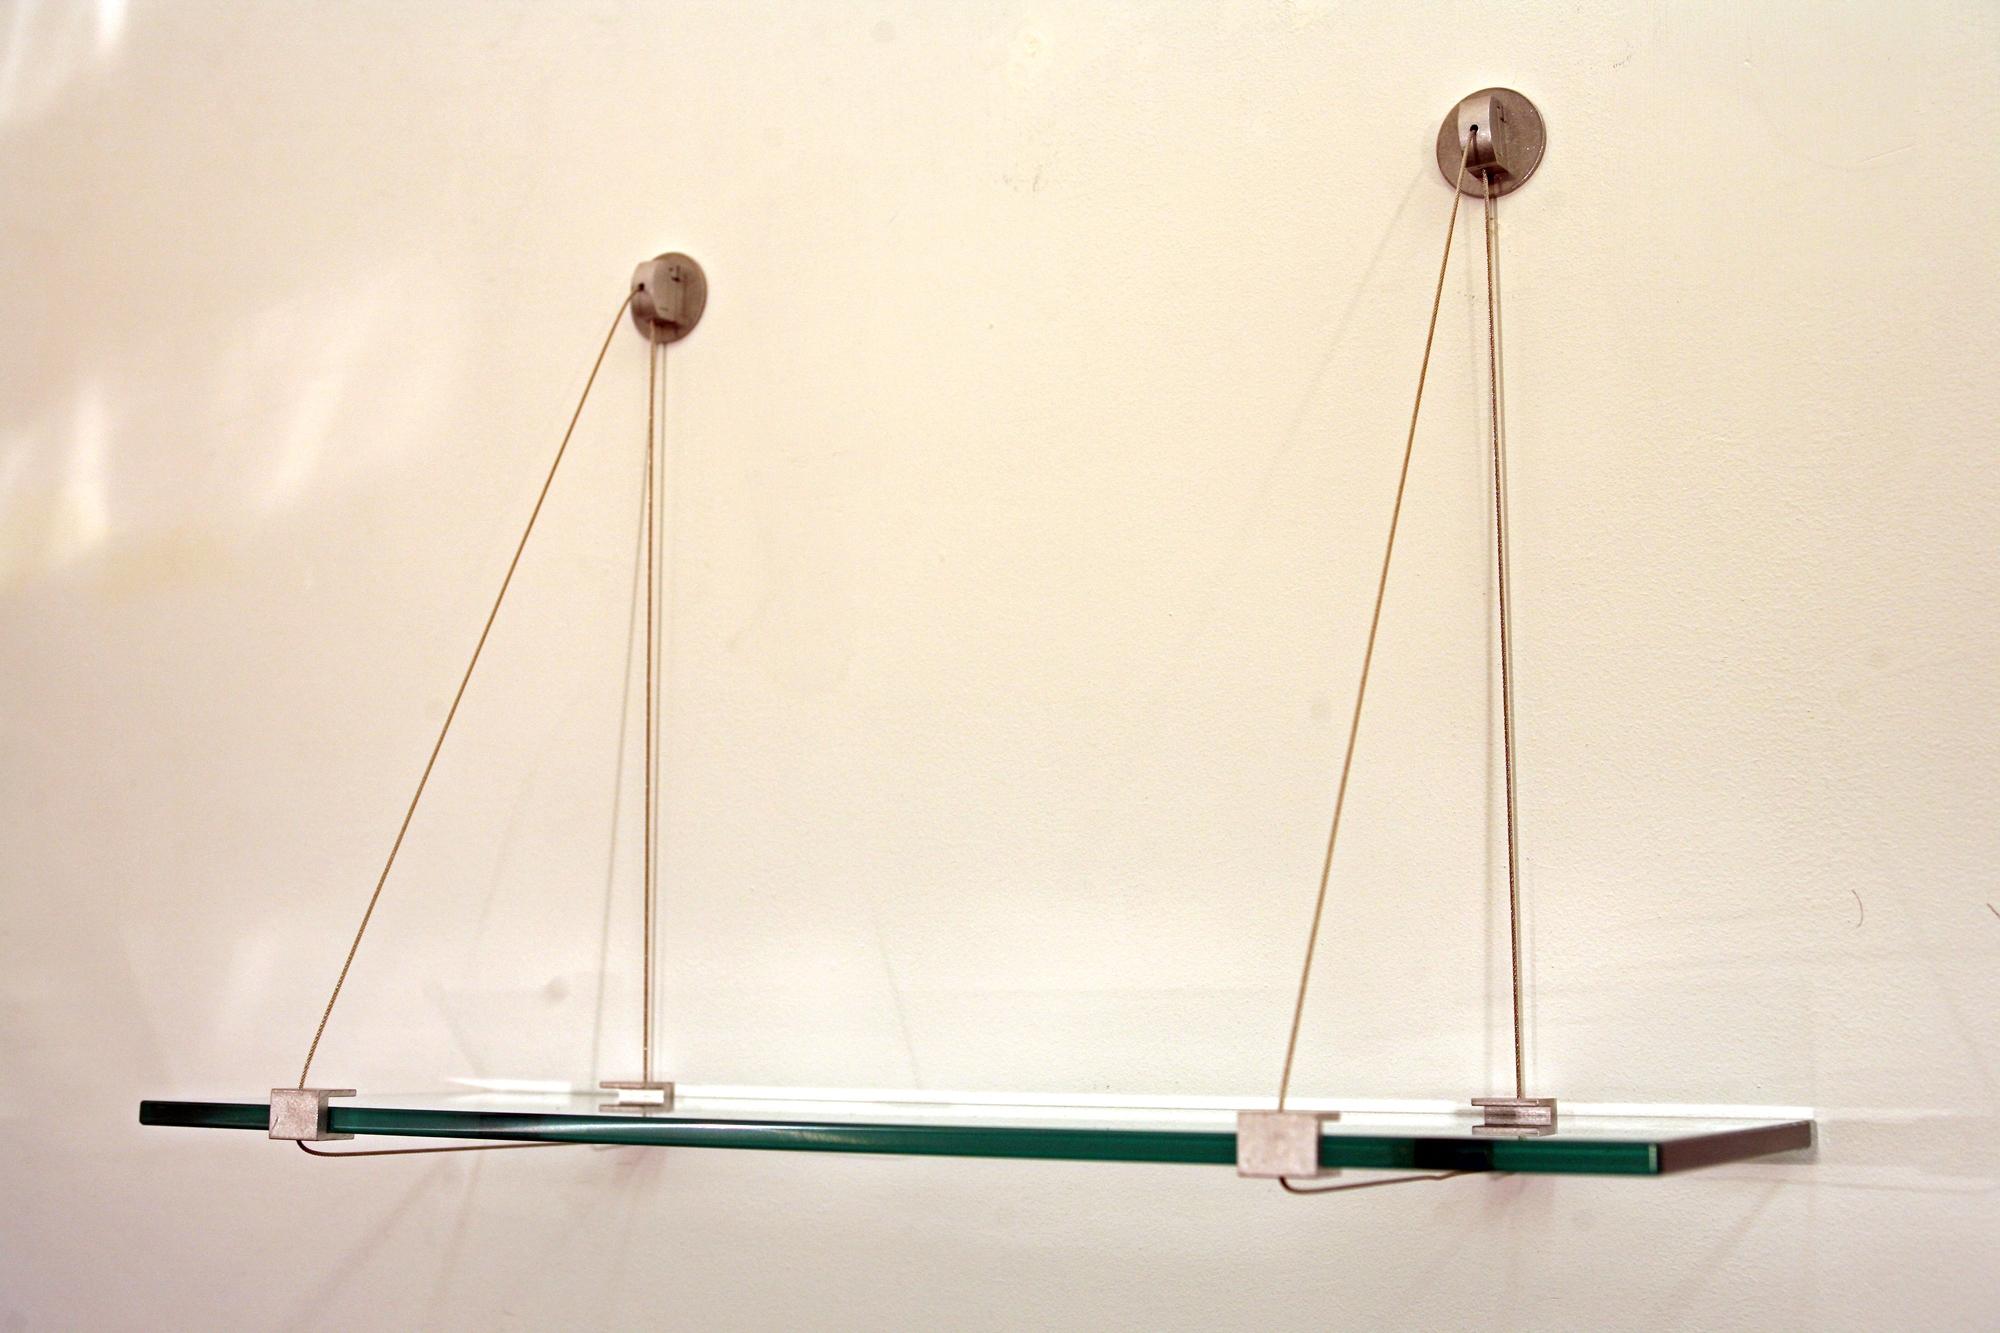 Rack Decorative Shelf Brackets For Under Wall Shelf Design Ideas Inside Glass Shelf Brackets Floating On Air (View 9 of 12)